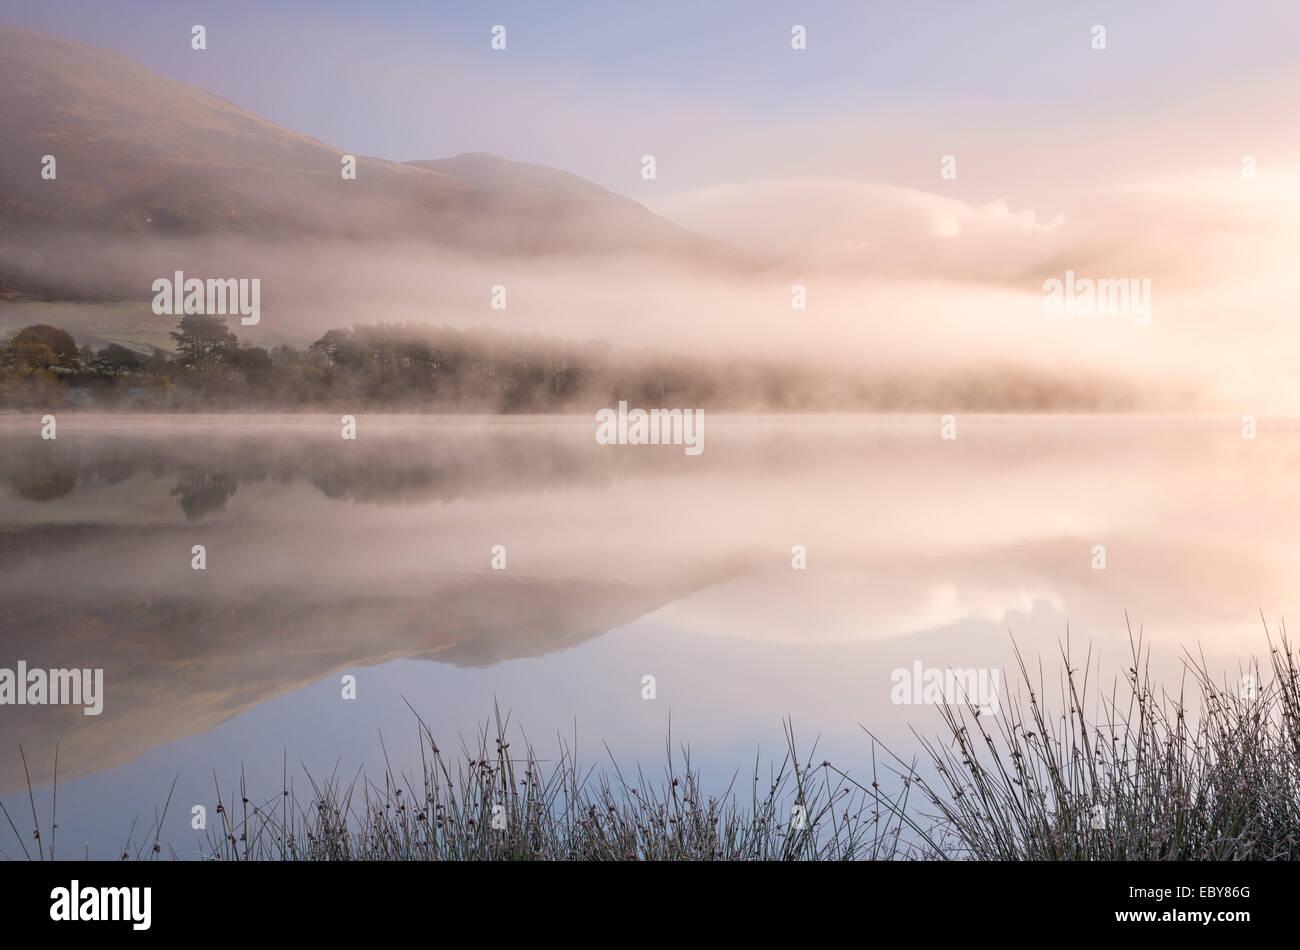 Nebligen Morgen über Loweswater im Lake District, Cumbria, England. Herbst (November) 2013. Stockbild